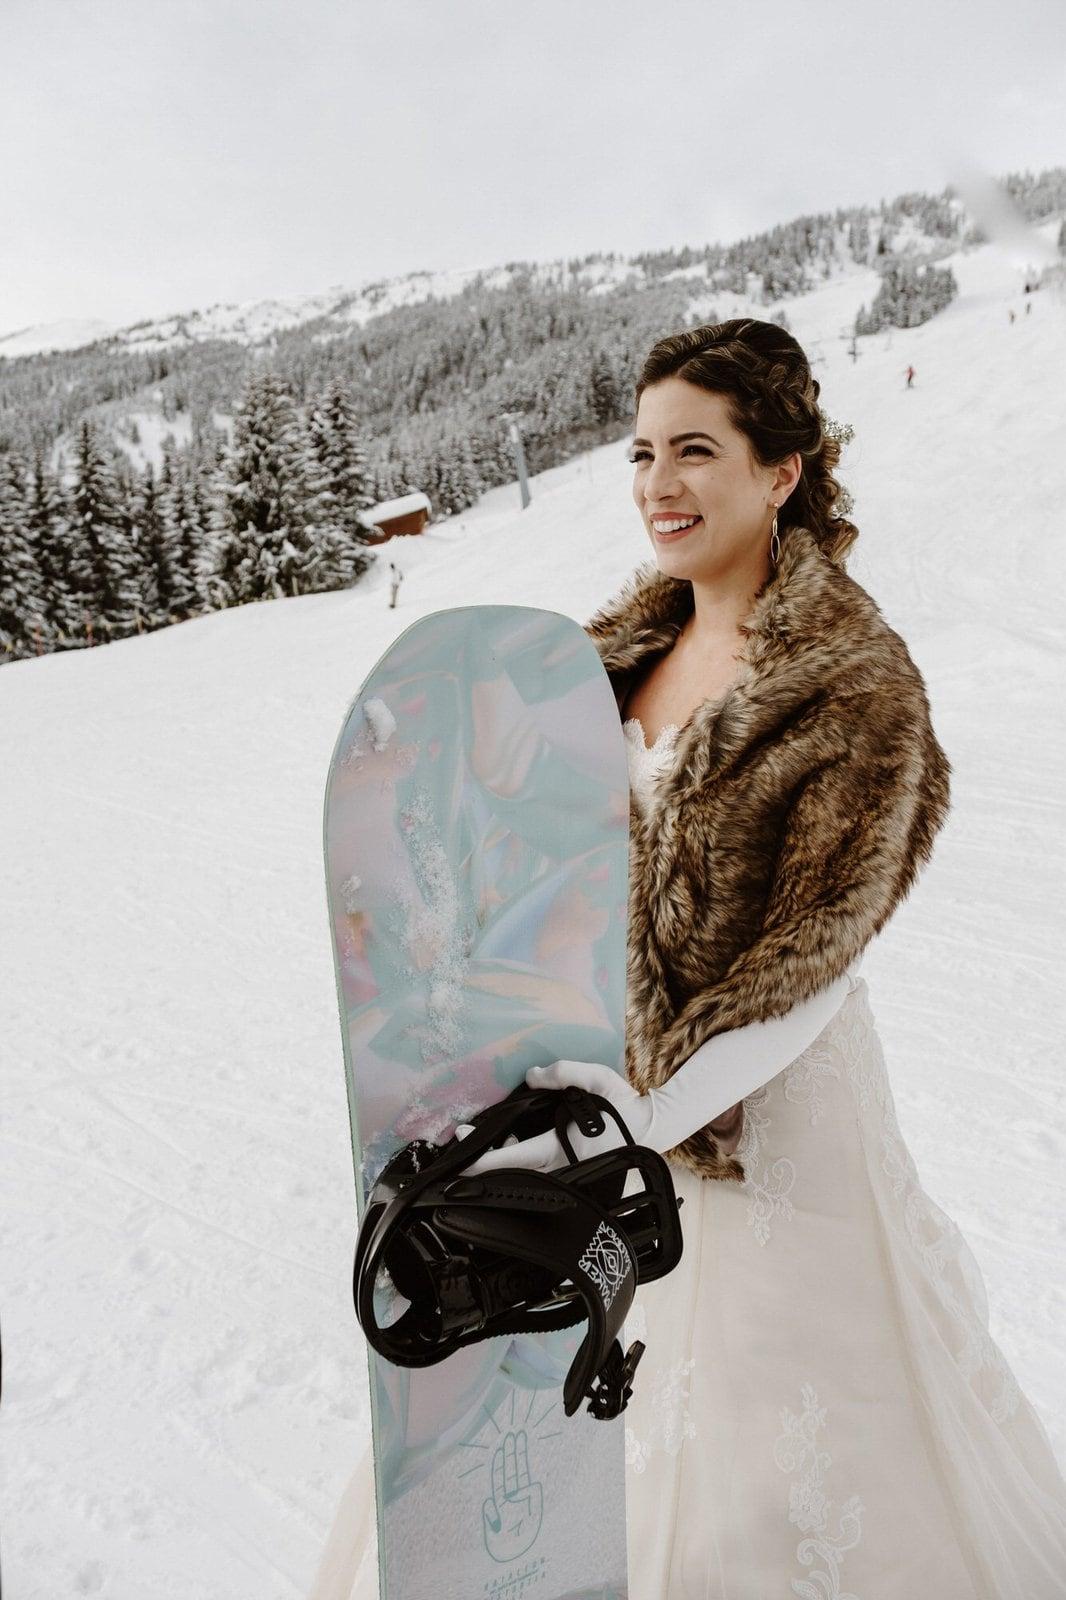 snowboard portraits